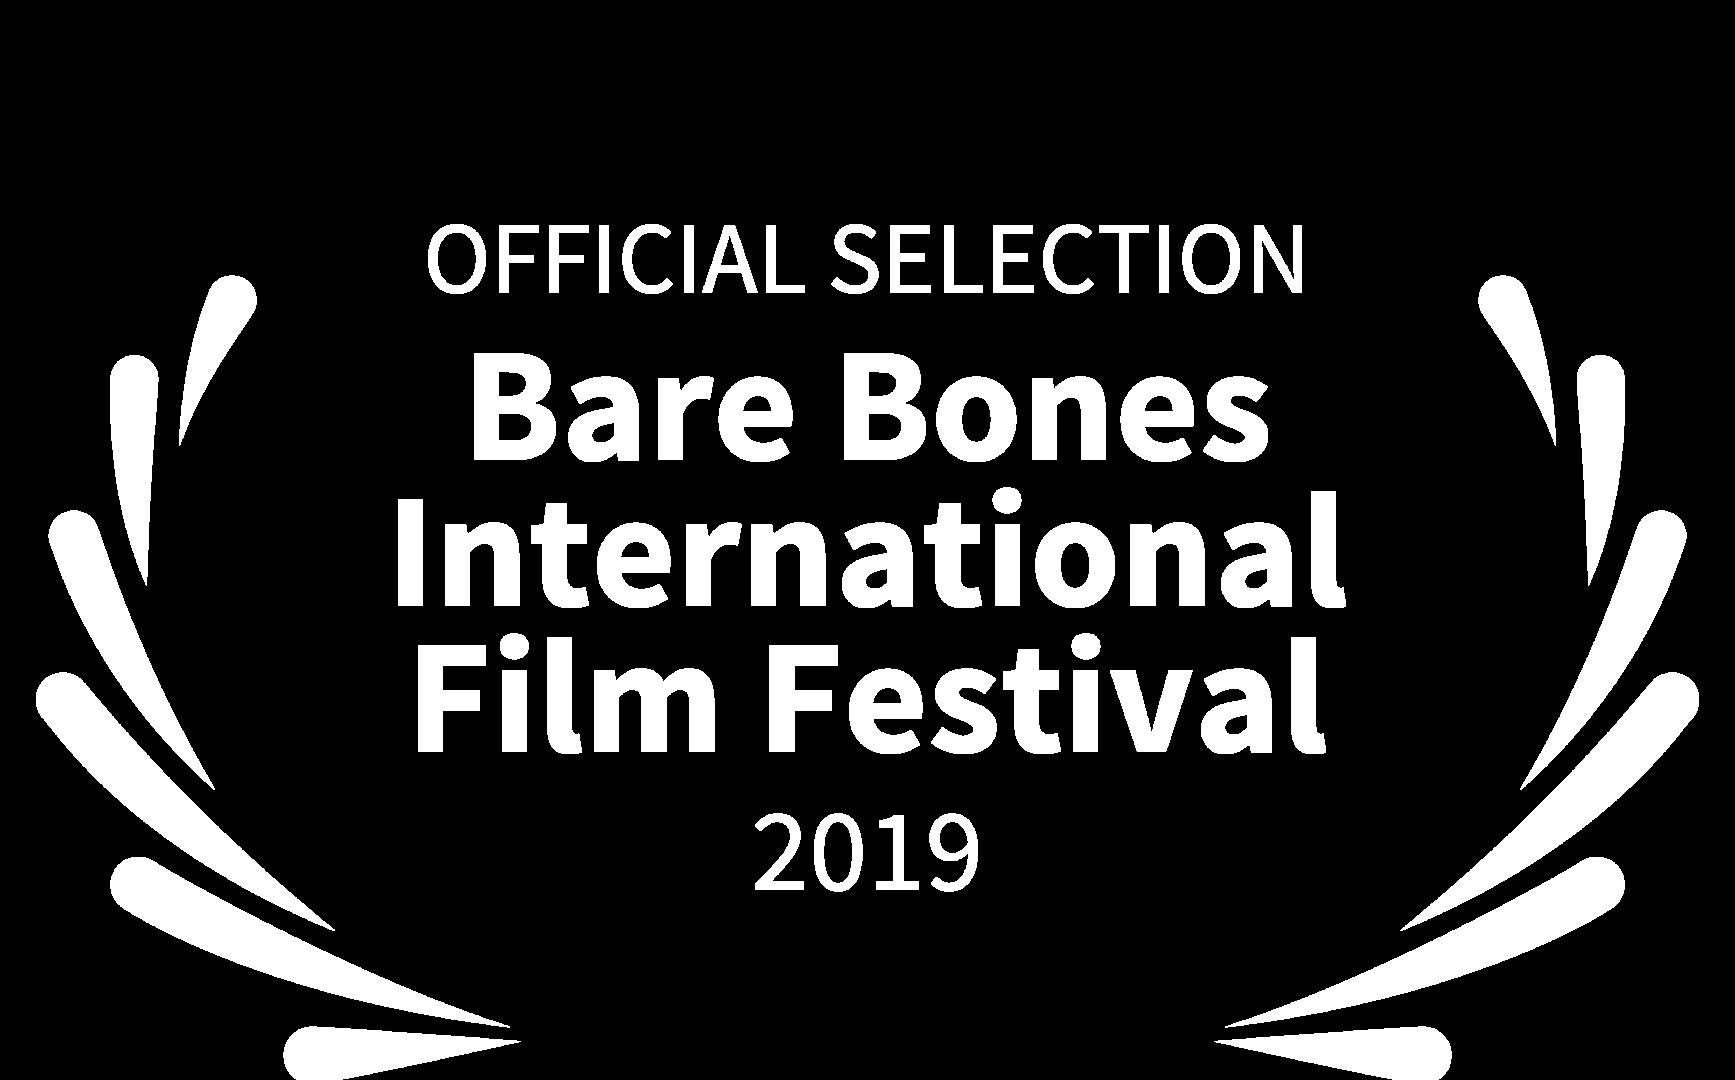 OFFICIAL SELECTION - Bare Bones - 2019.p